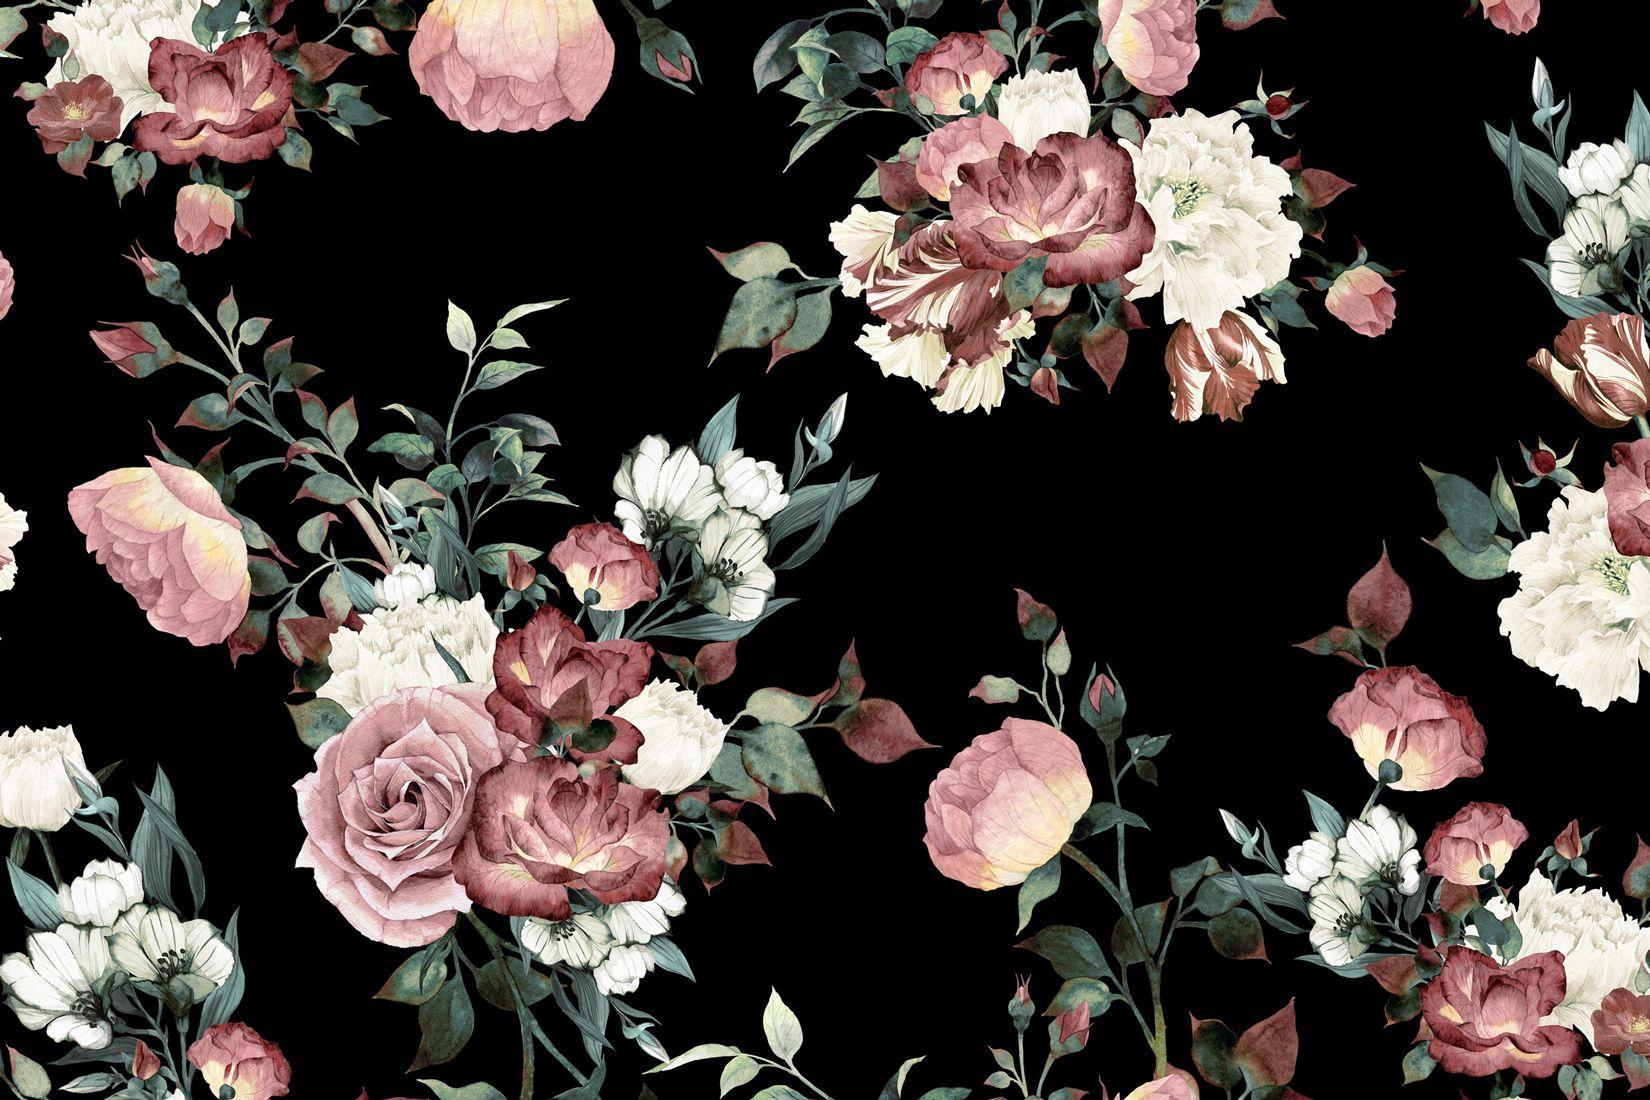 Vintage Flower Wallpaper (104 Wallpapers) - HD Wallpapers